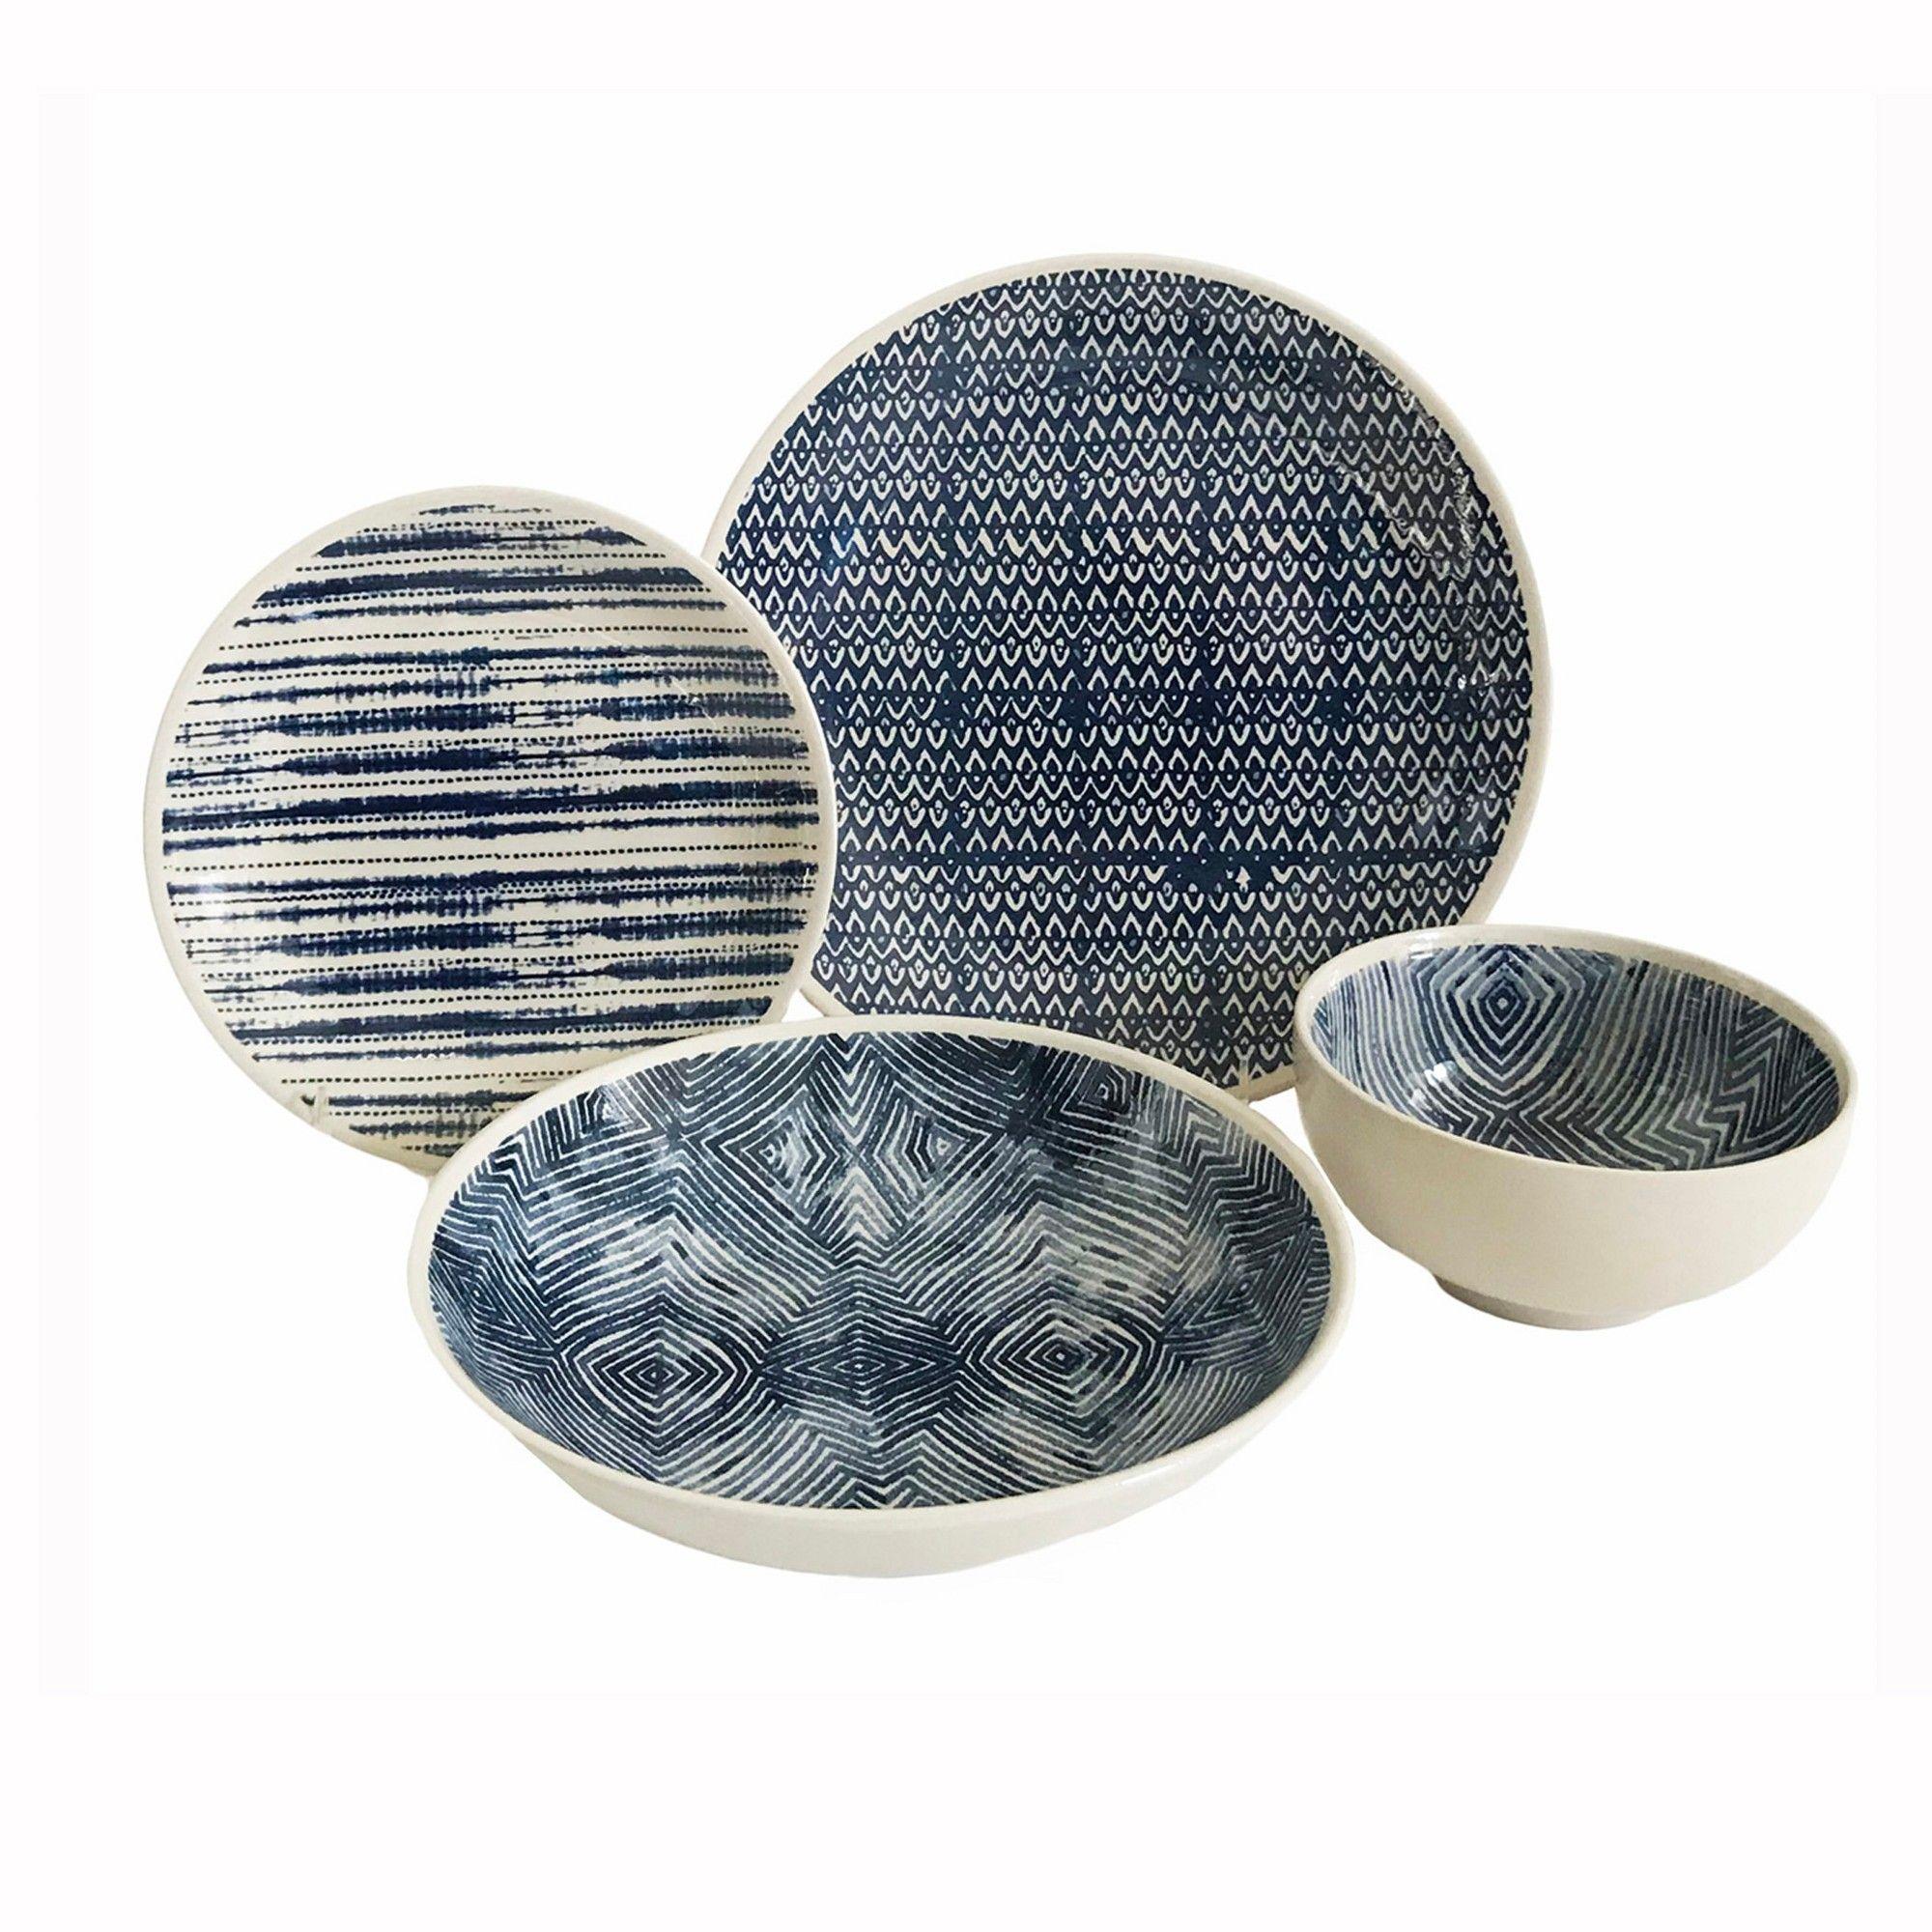 Moroccan Mediterranean Style Dinner Set 12Pcs Porcelain Side Plates Bowls Blue